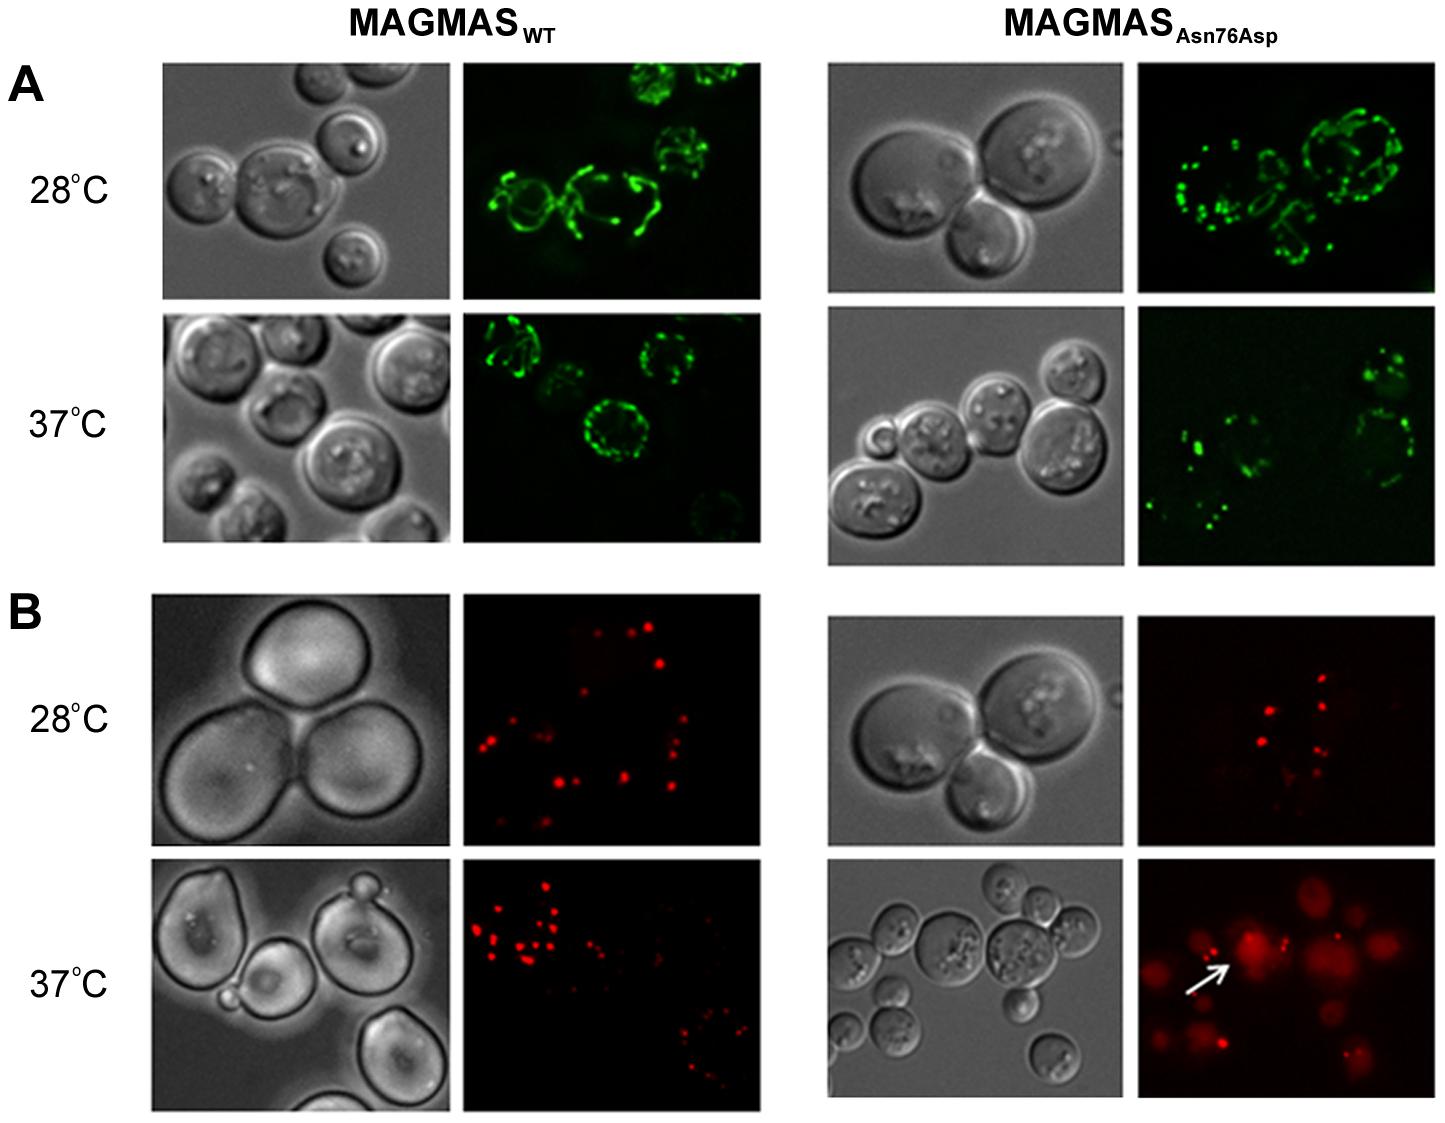 Morphological defects of the yeast <i>MAGMAS</i> mutant strain.